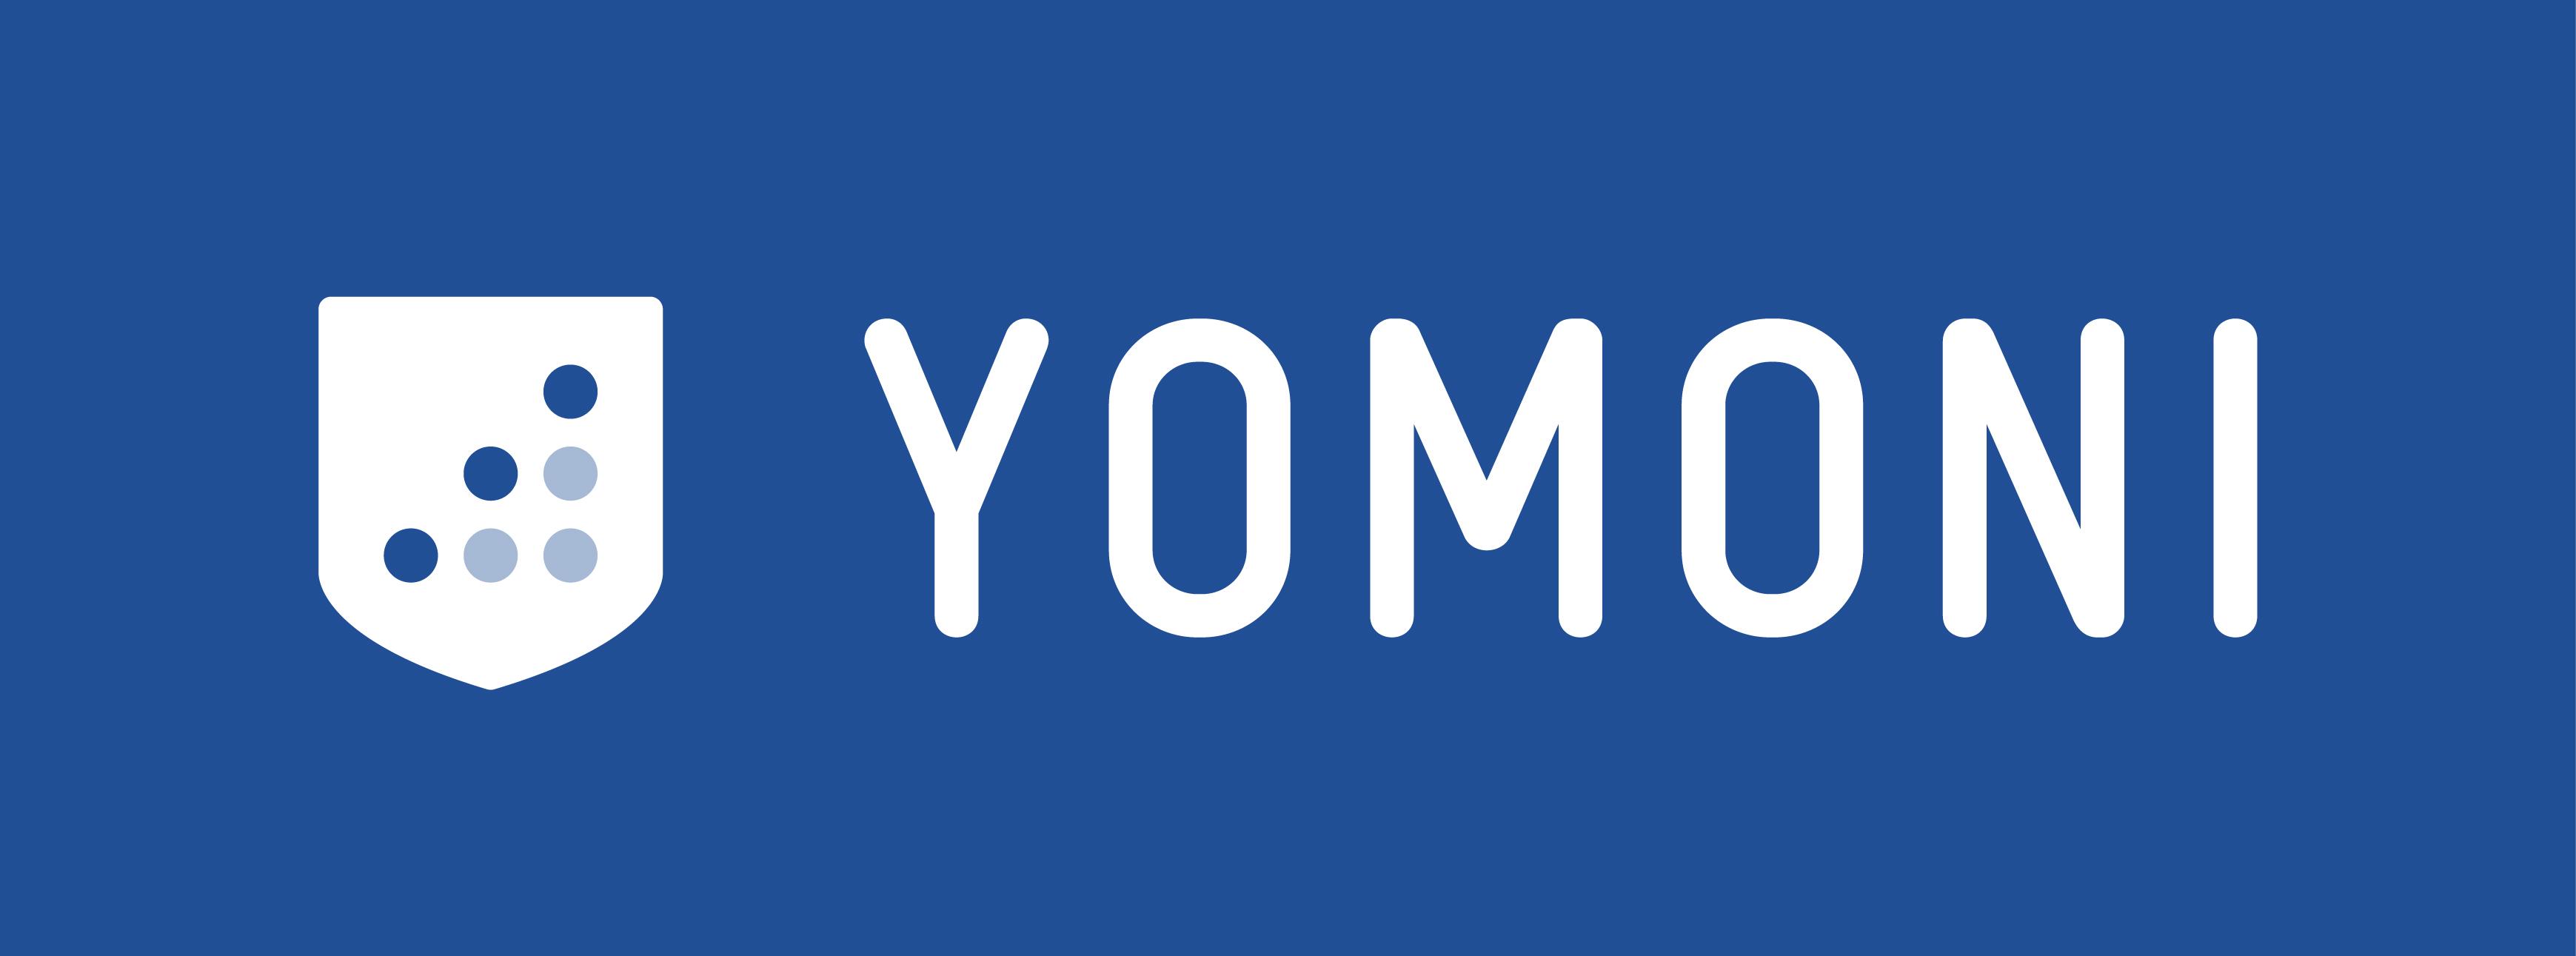 YOMONI-LogoHLogo-RVB(Ne¦ügatif)